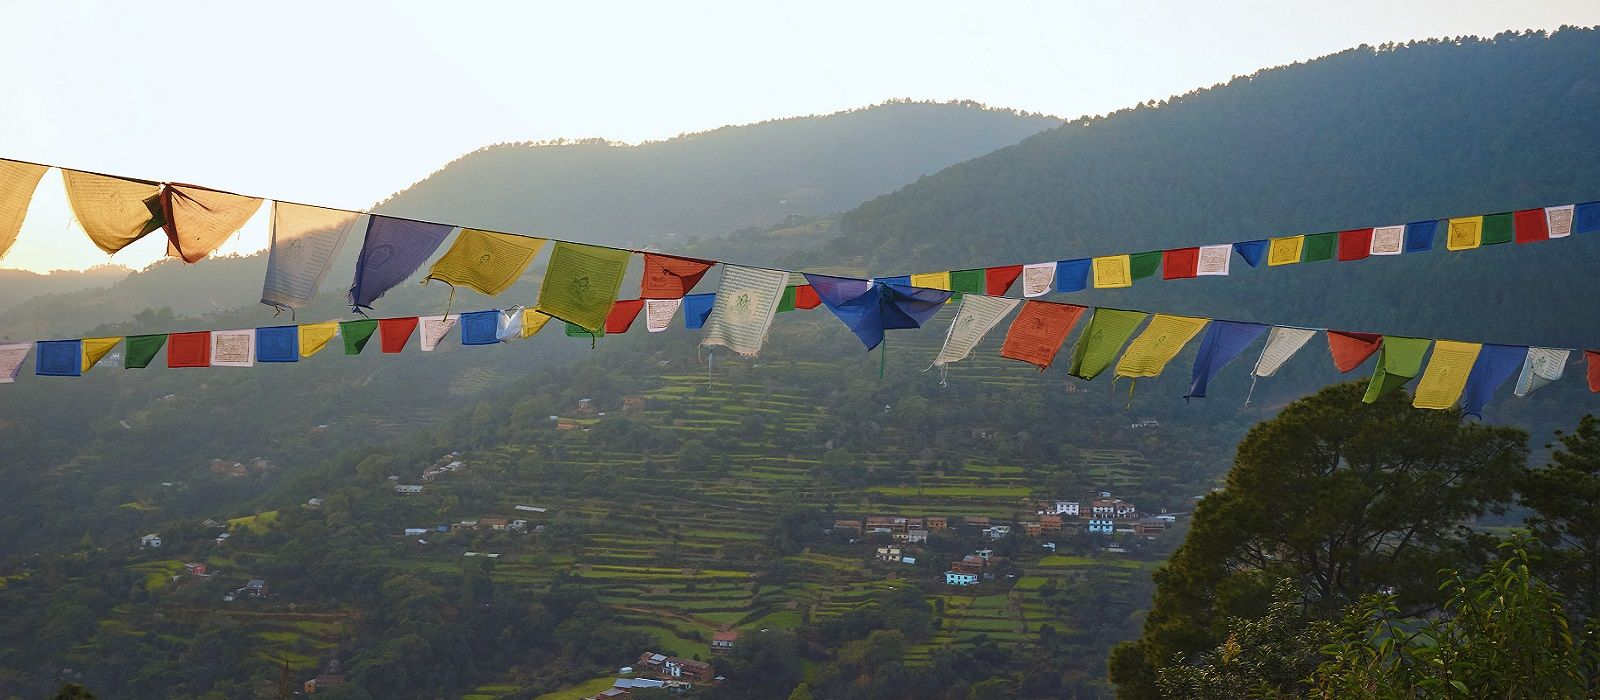 Destination Pharping Nepal